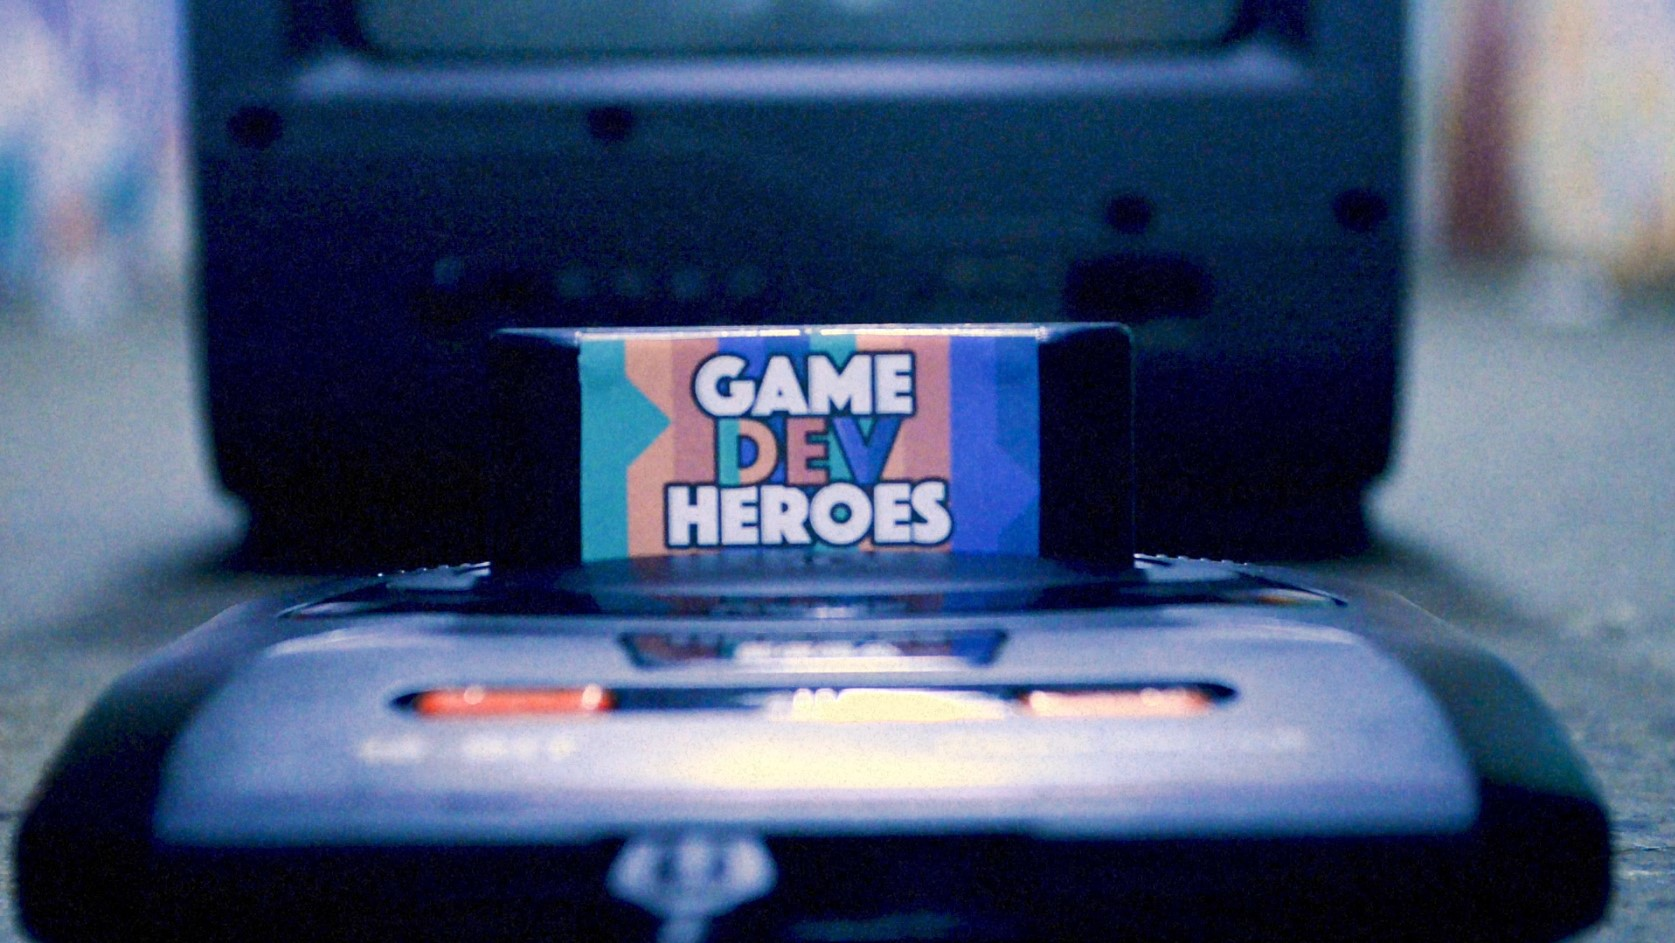 Game Dev Heroes 2019 showcase